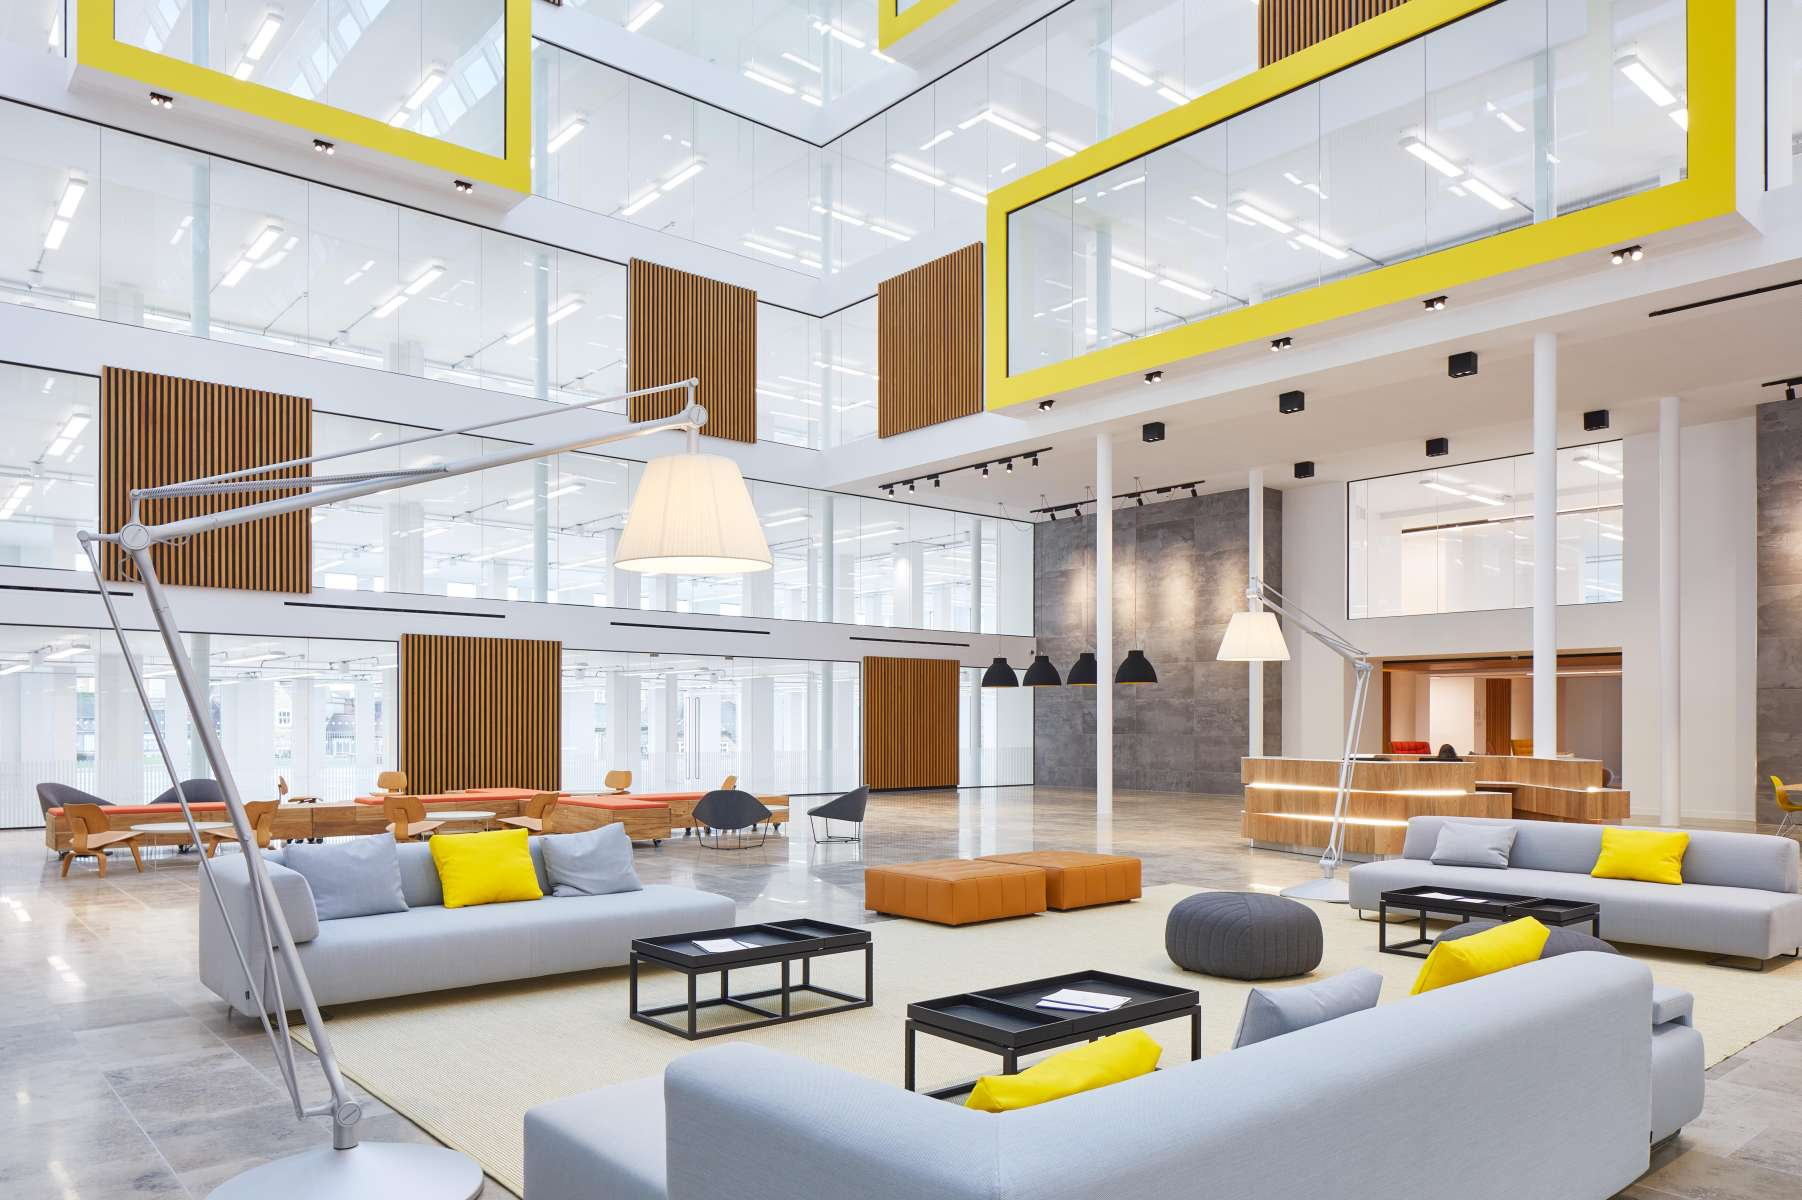 Office furniture uxbridge - Scrollleftscrollright